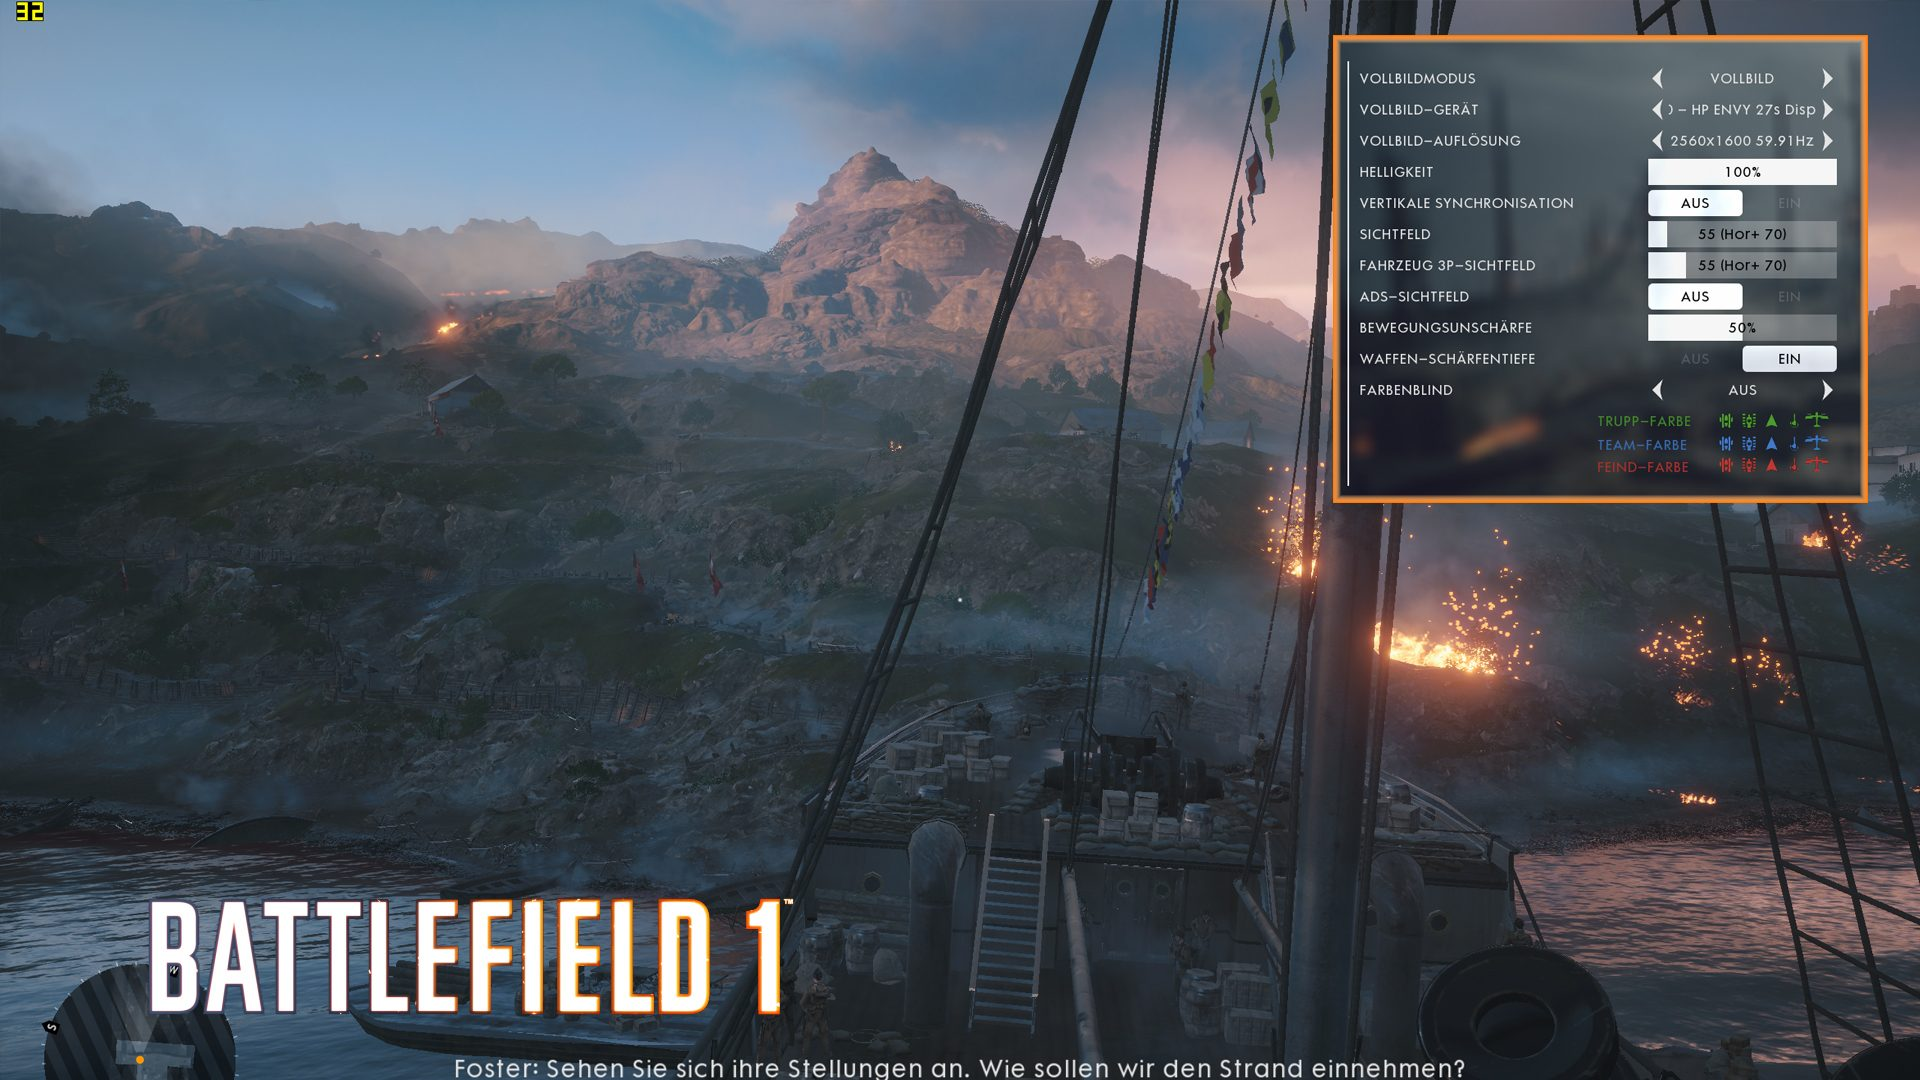 Asus-Zenbook-Battlefield-1-Monitor